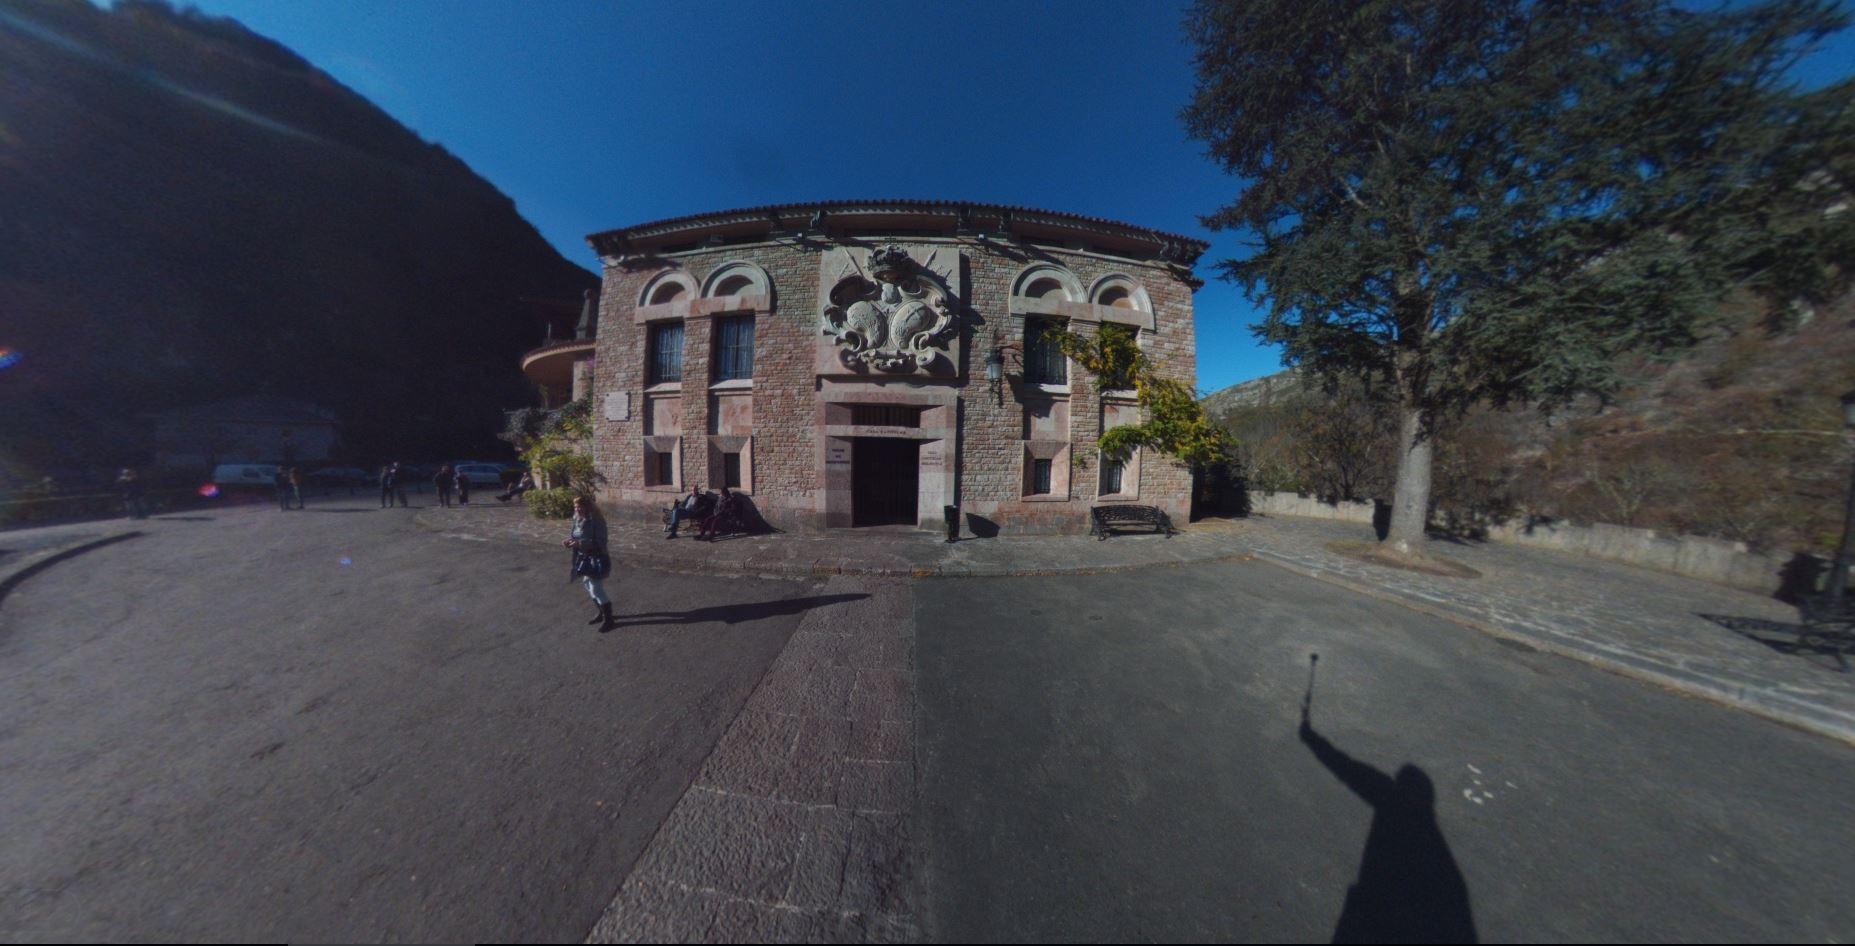 Fotos 360 Casa Capitular de Covadonga. #VidePan por #Asturias